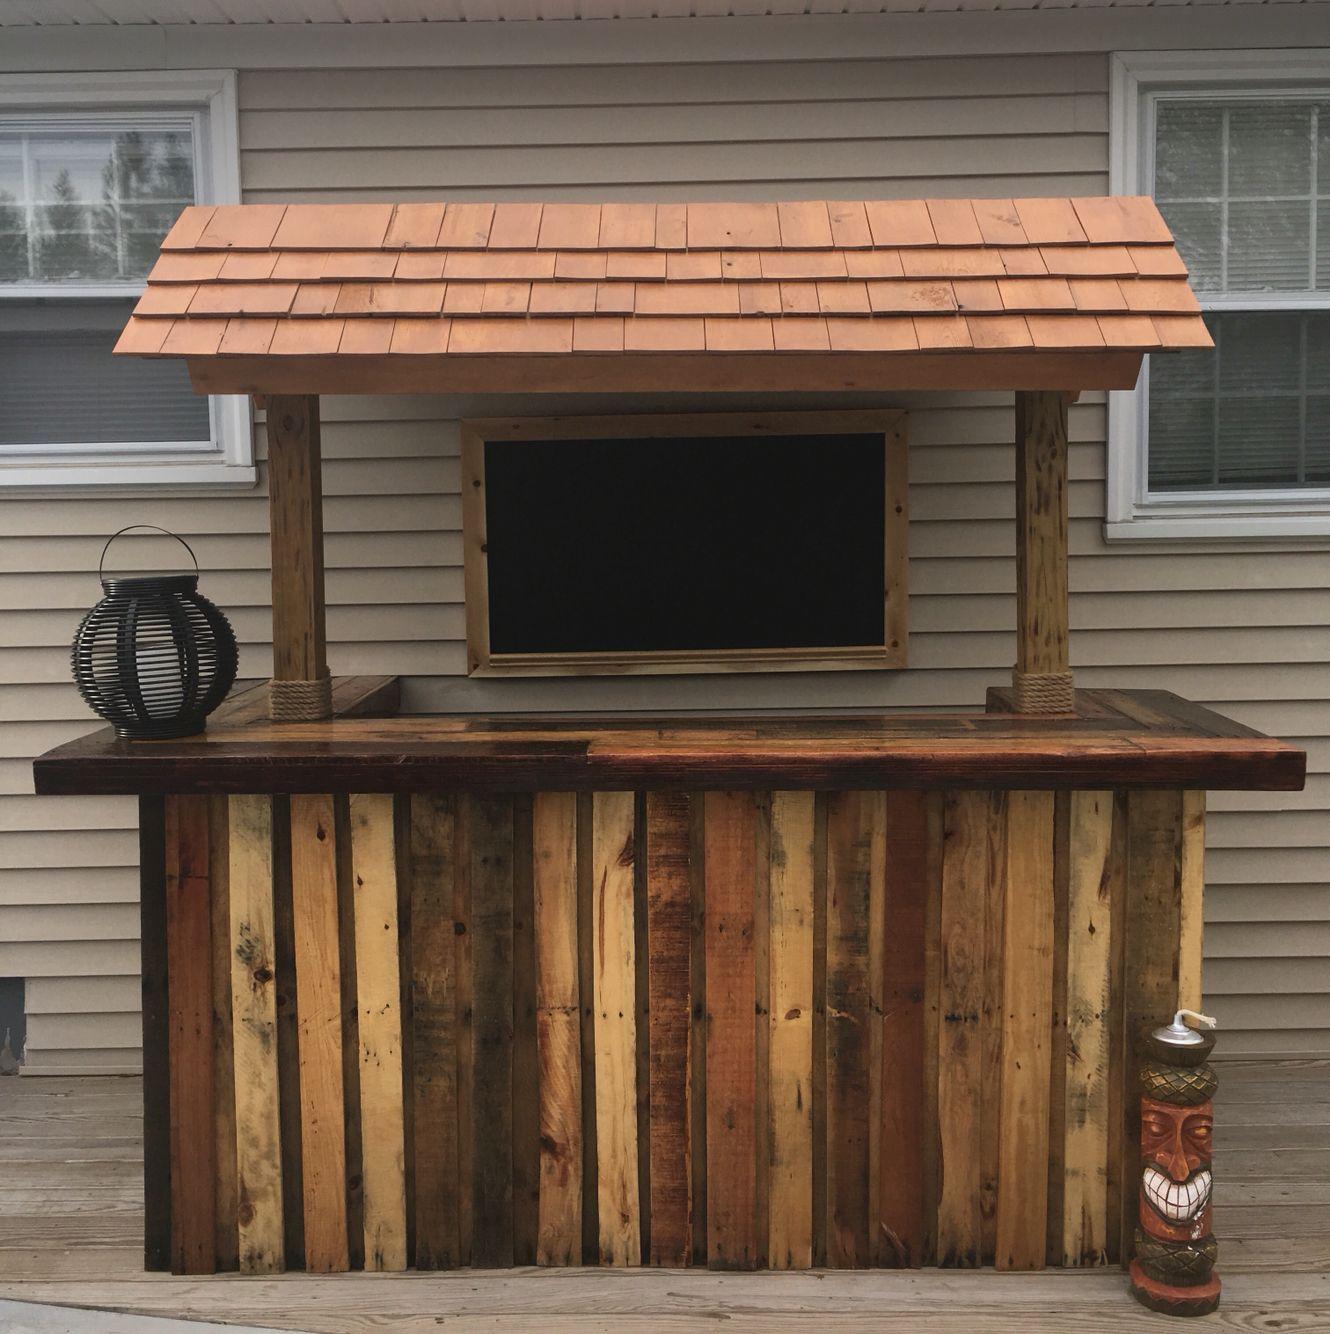 Outdoor pallet bar #diy #palletbar #palletwood #tikibar #backyard ...